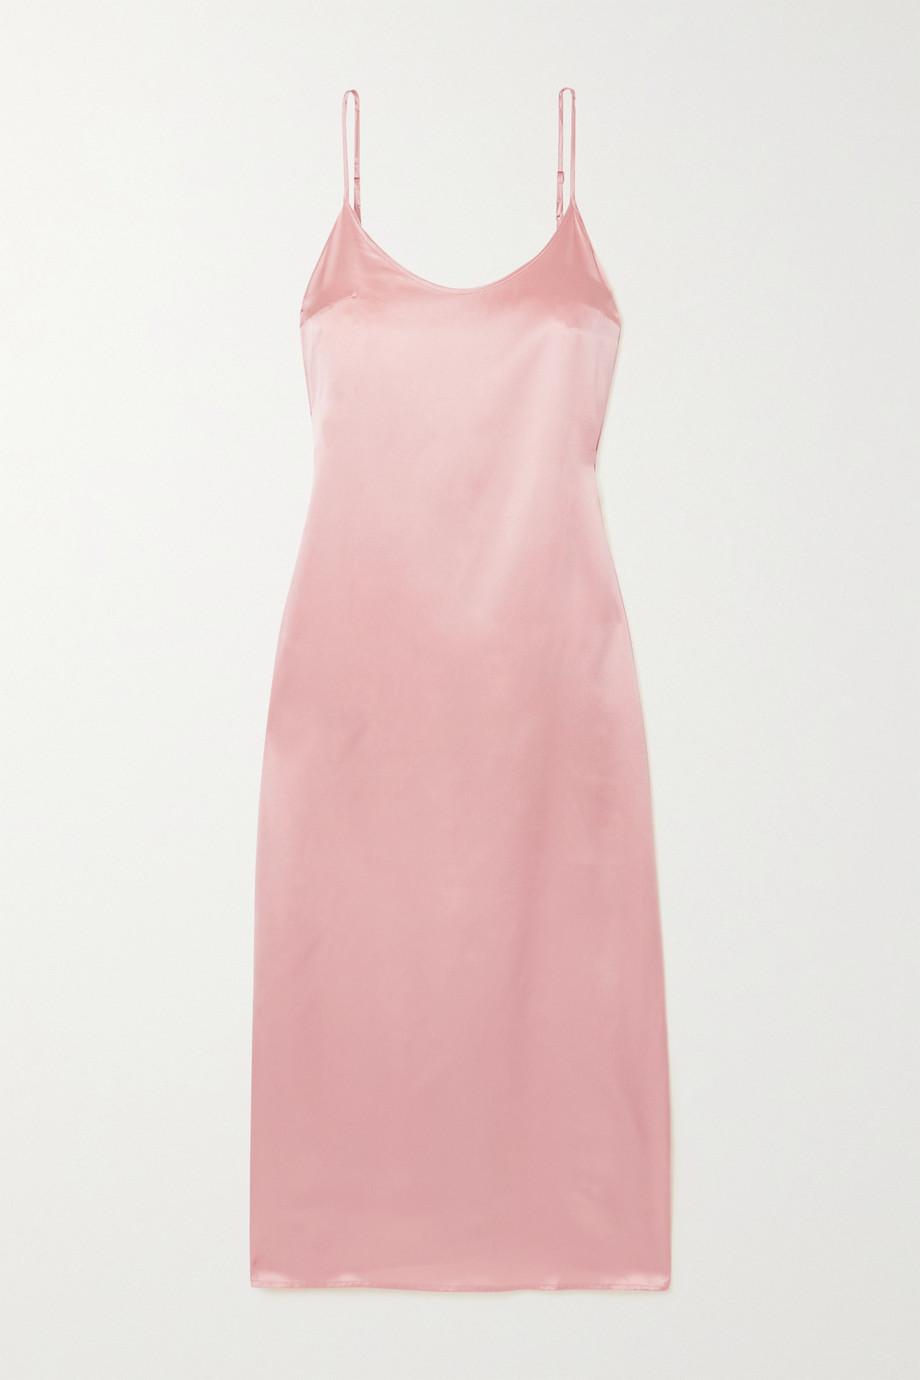 La Perla Silk-satin nightdress